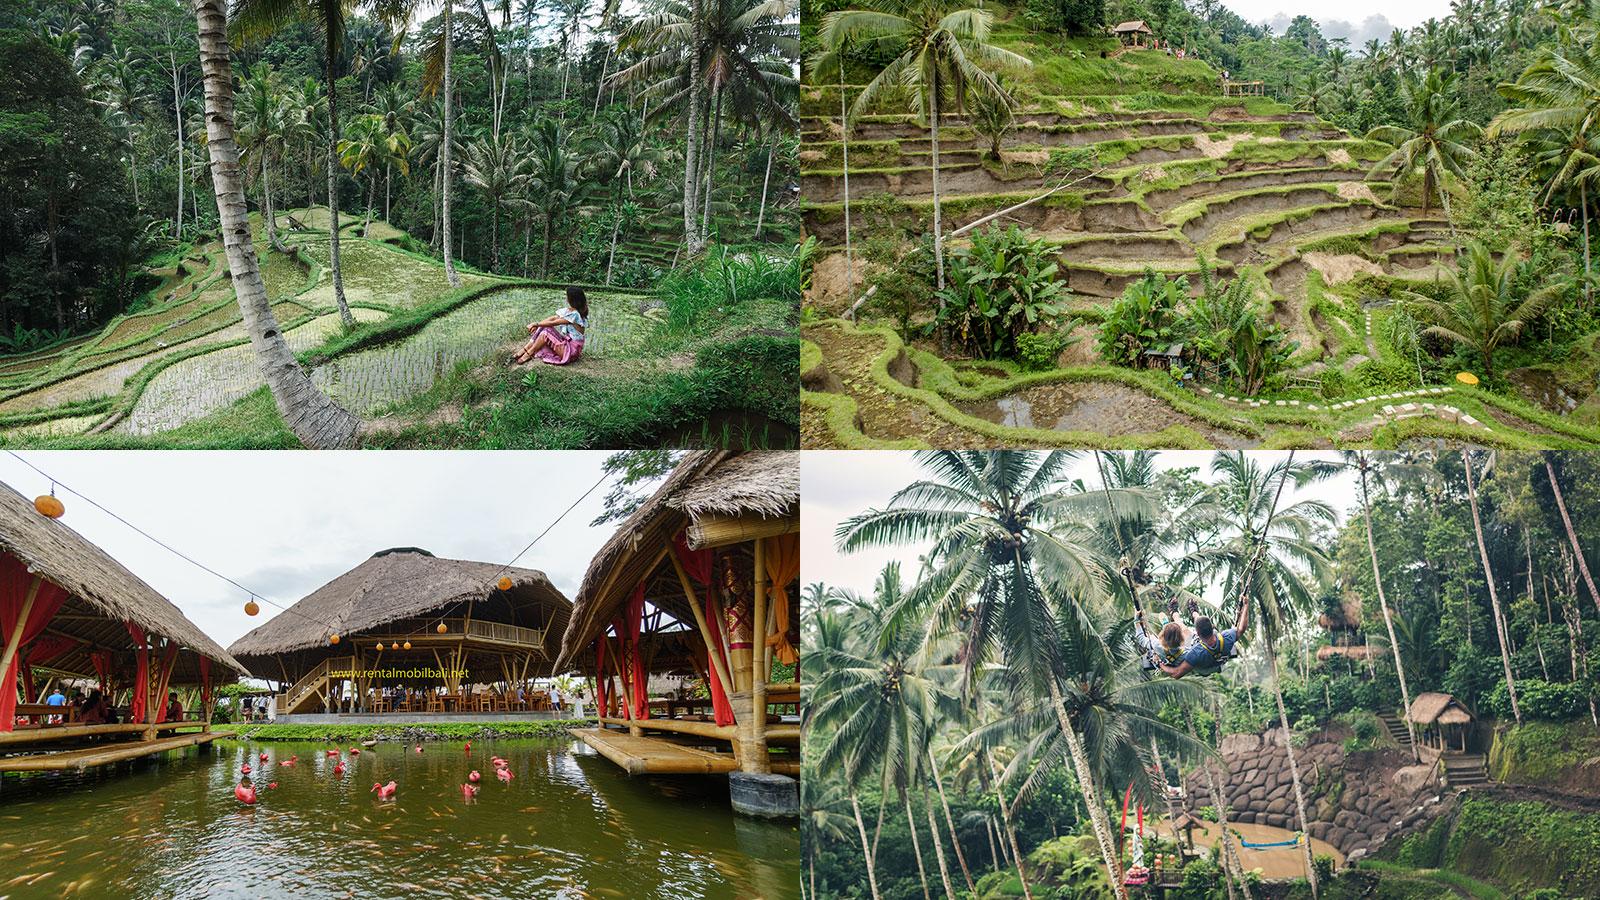 Pesona Indonesia, Wisata Ubud Bali Primadona Pariwisata Indonesia